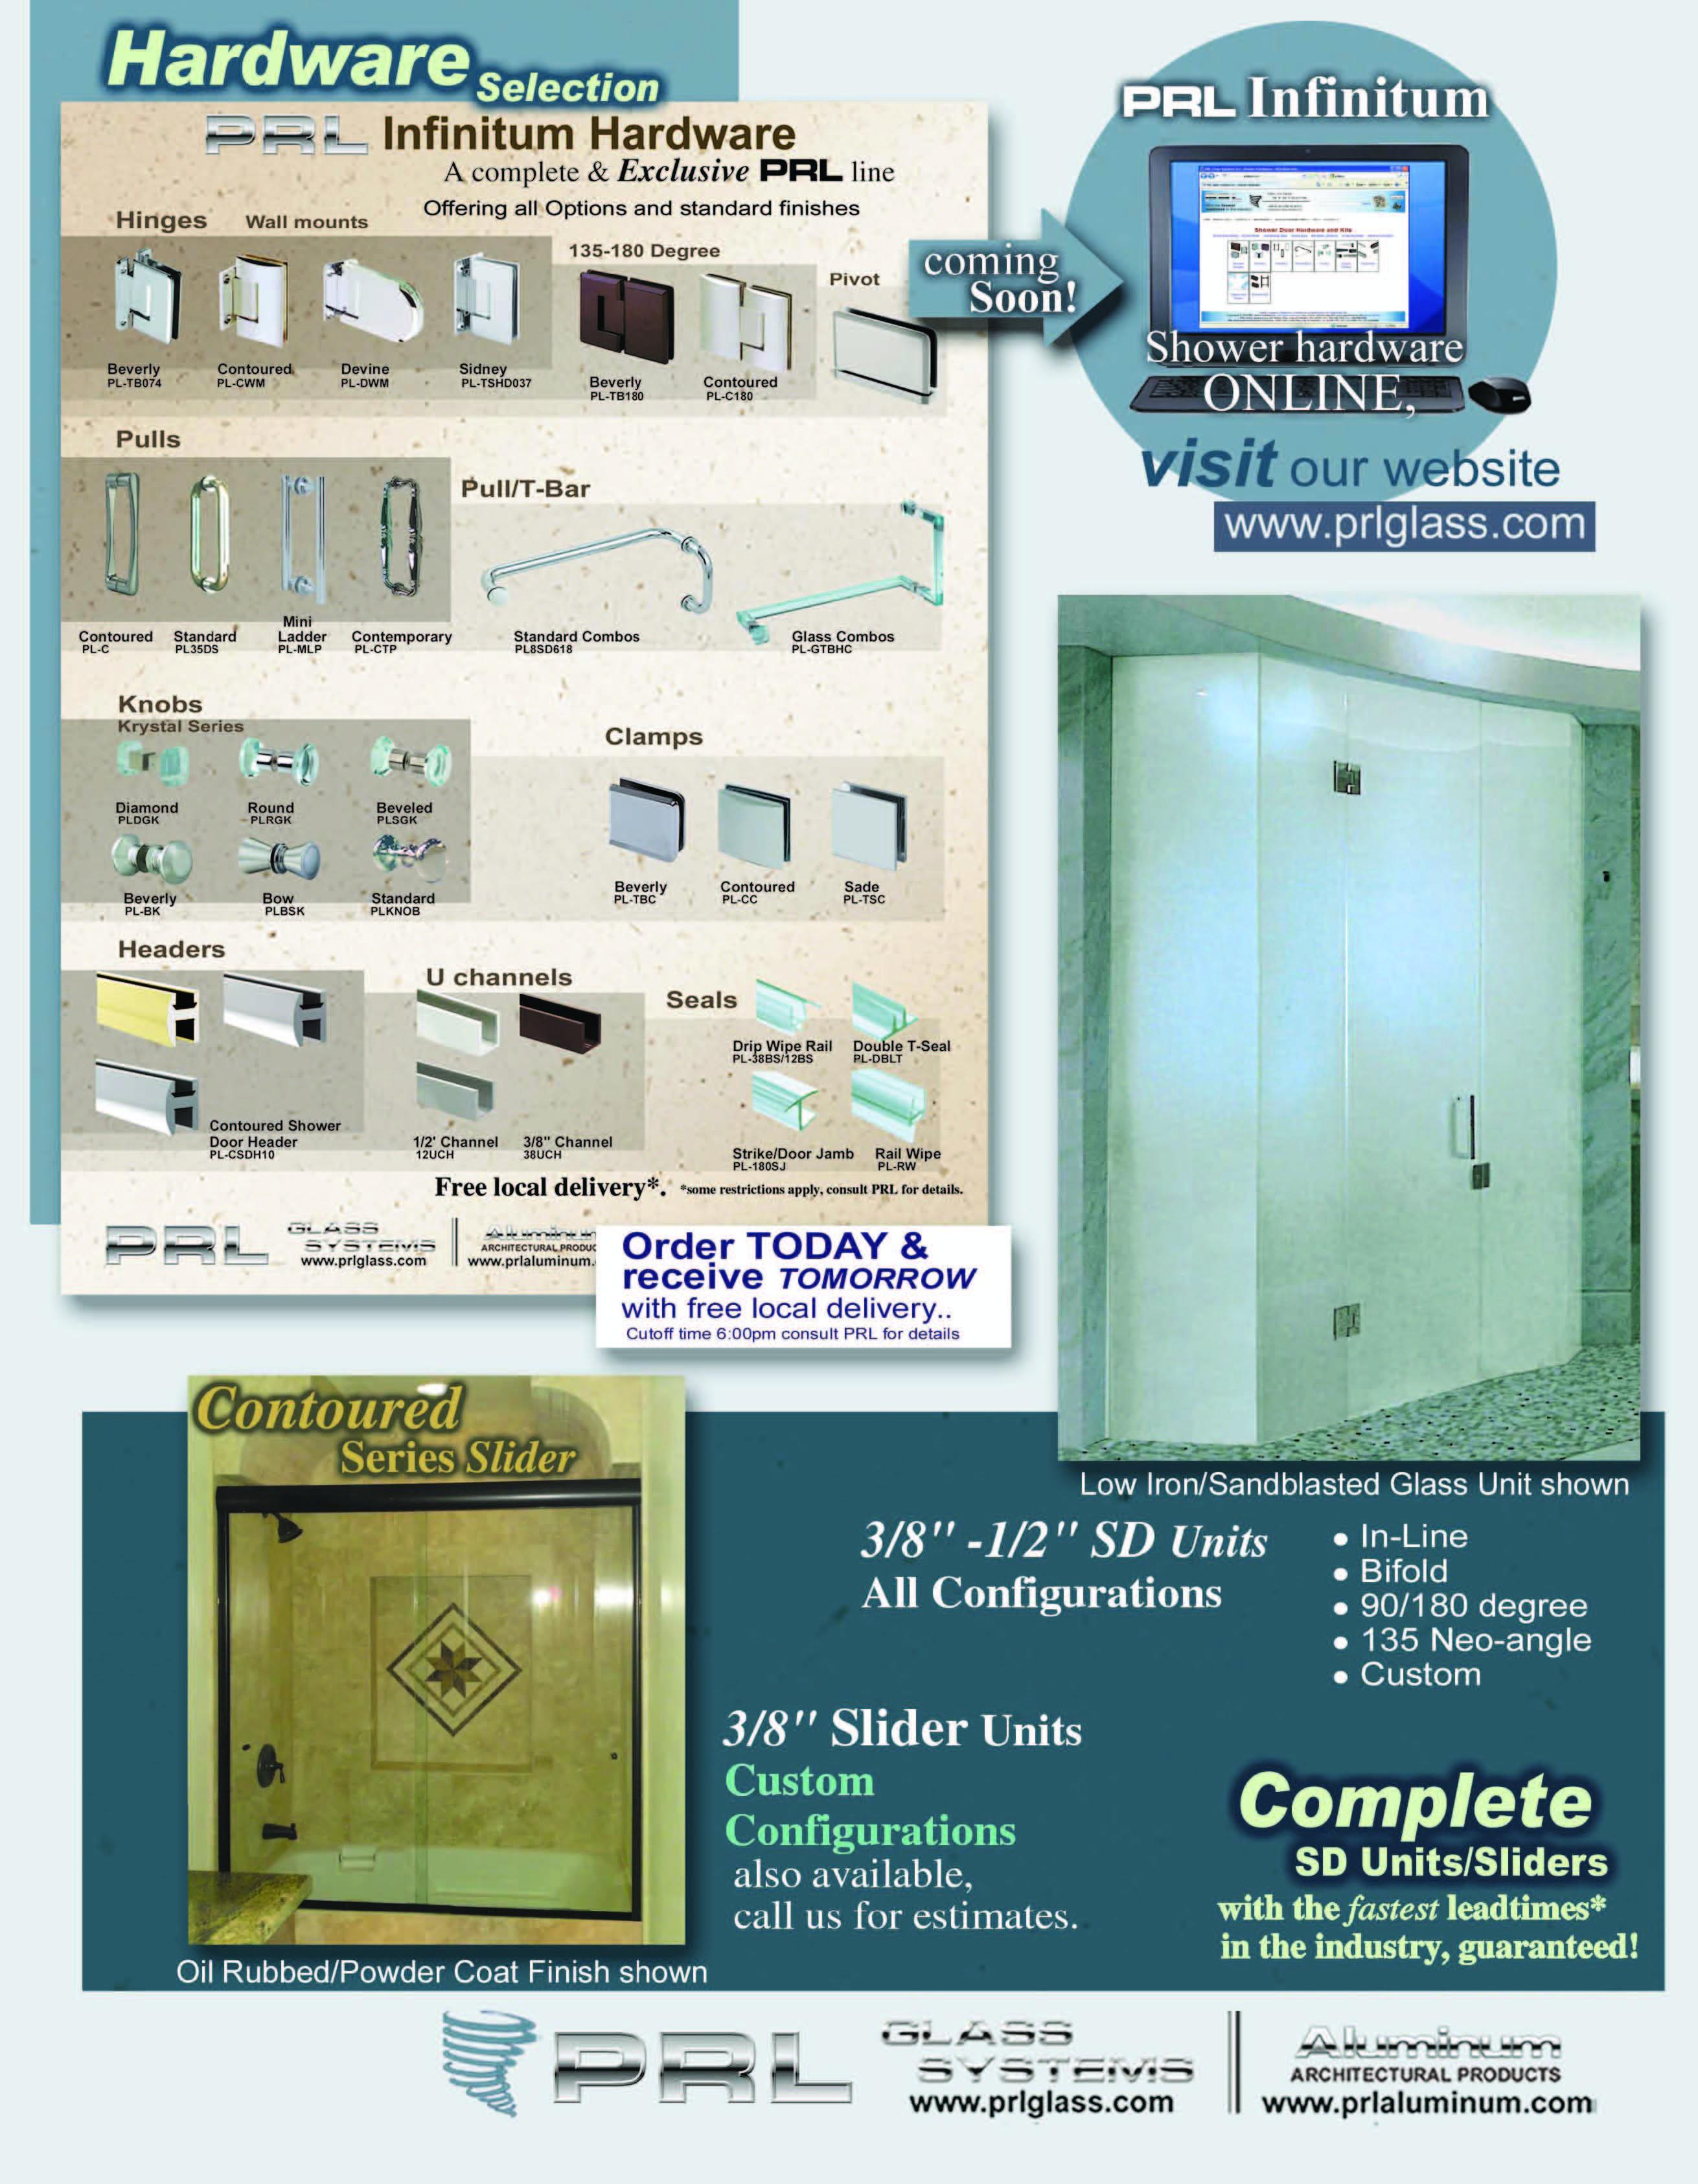 Shower Door Hardware, Handles, Mounts, Hinges, Kits and more.